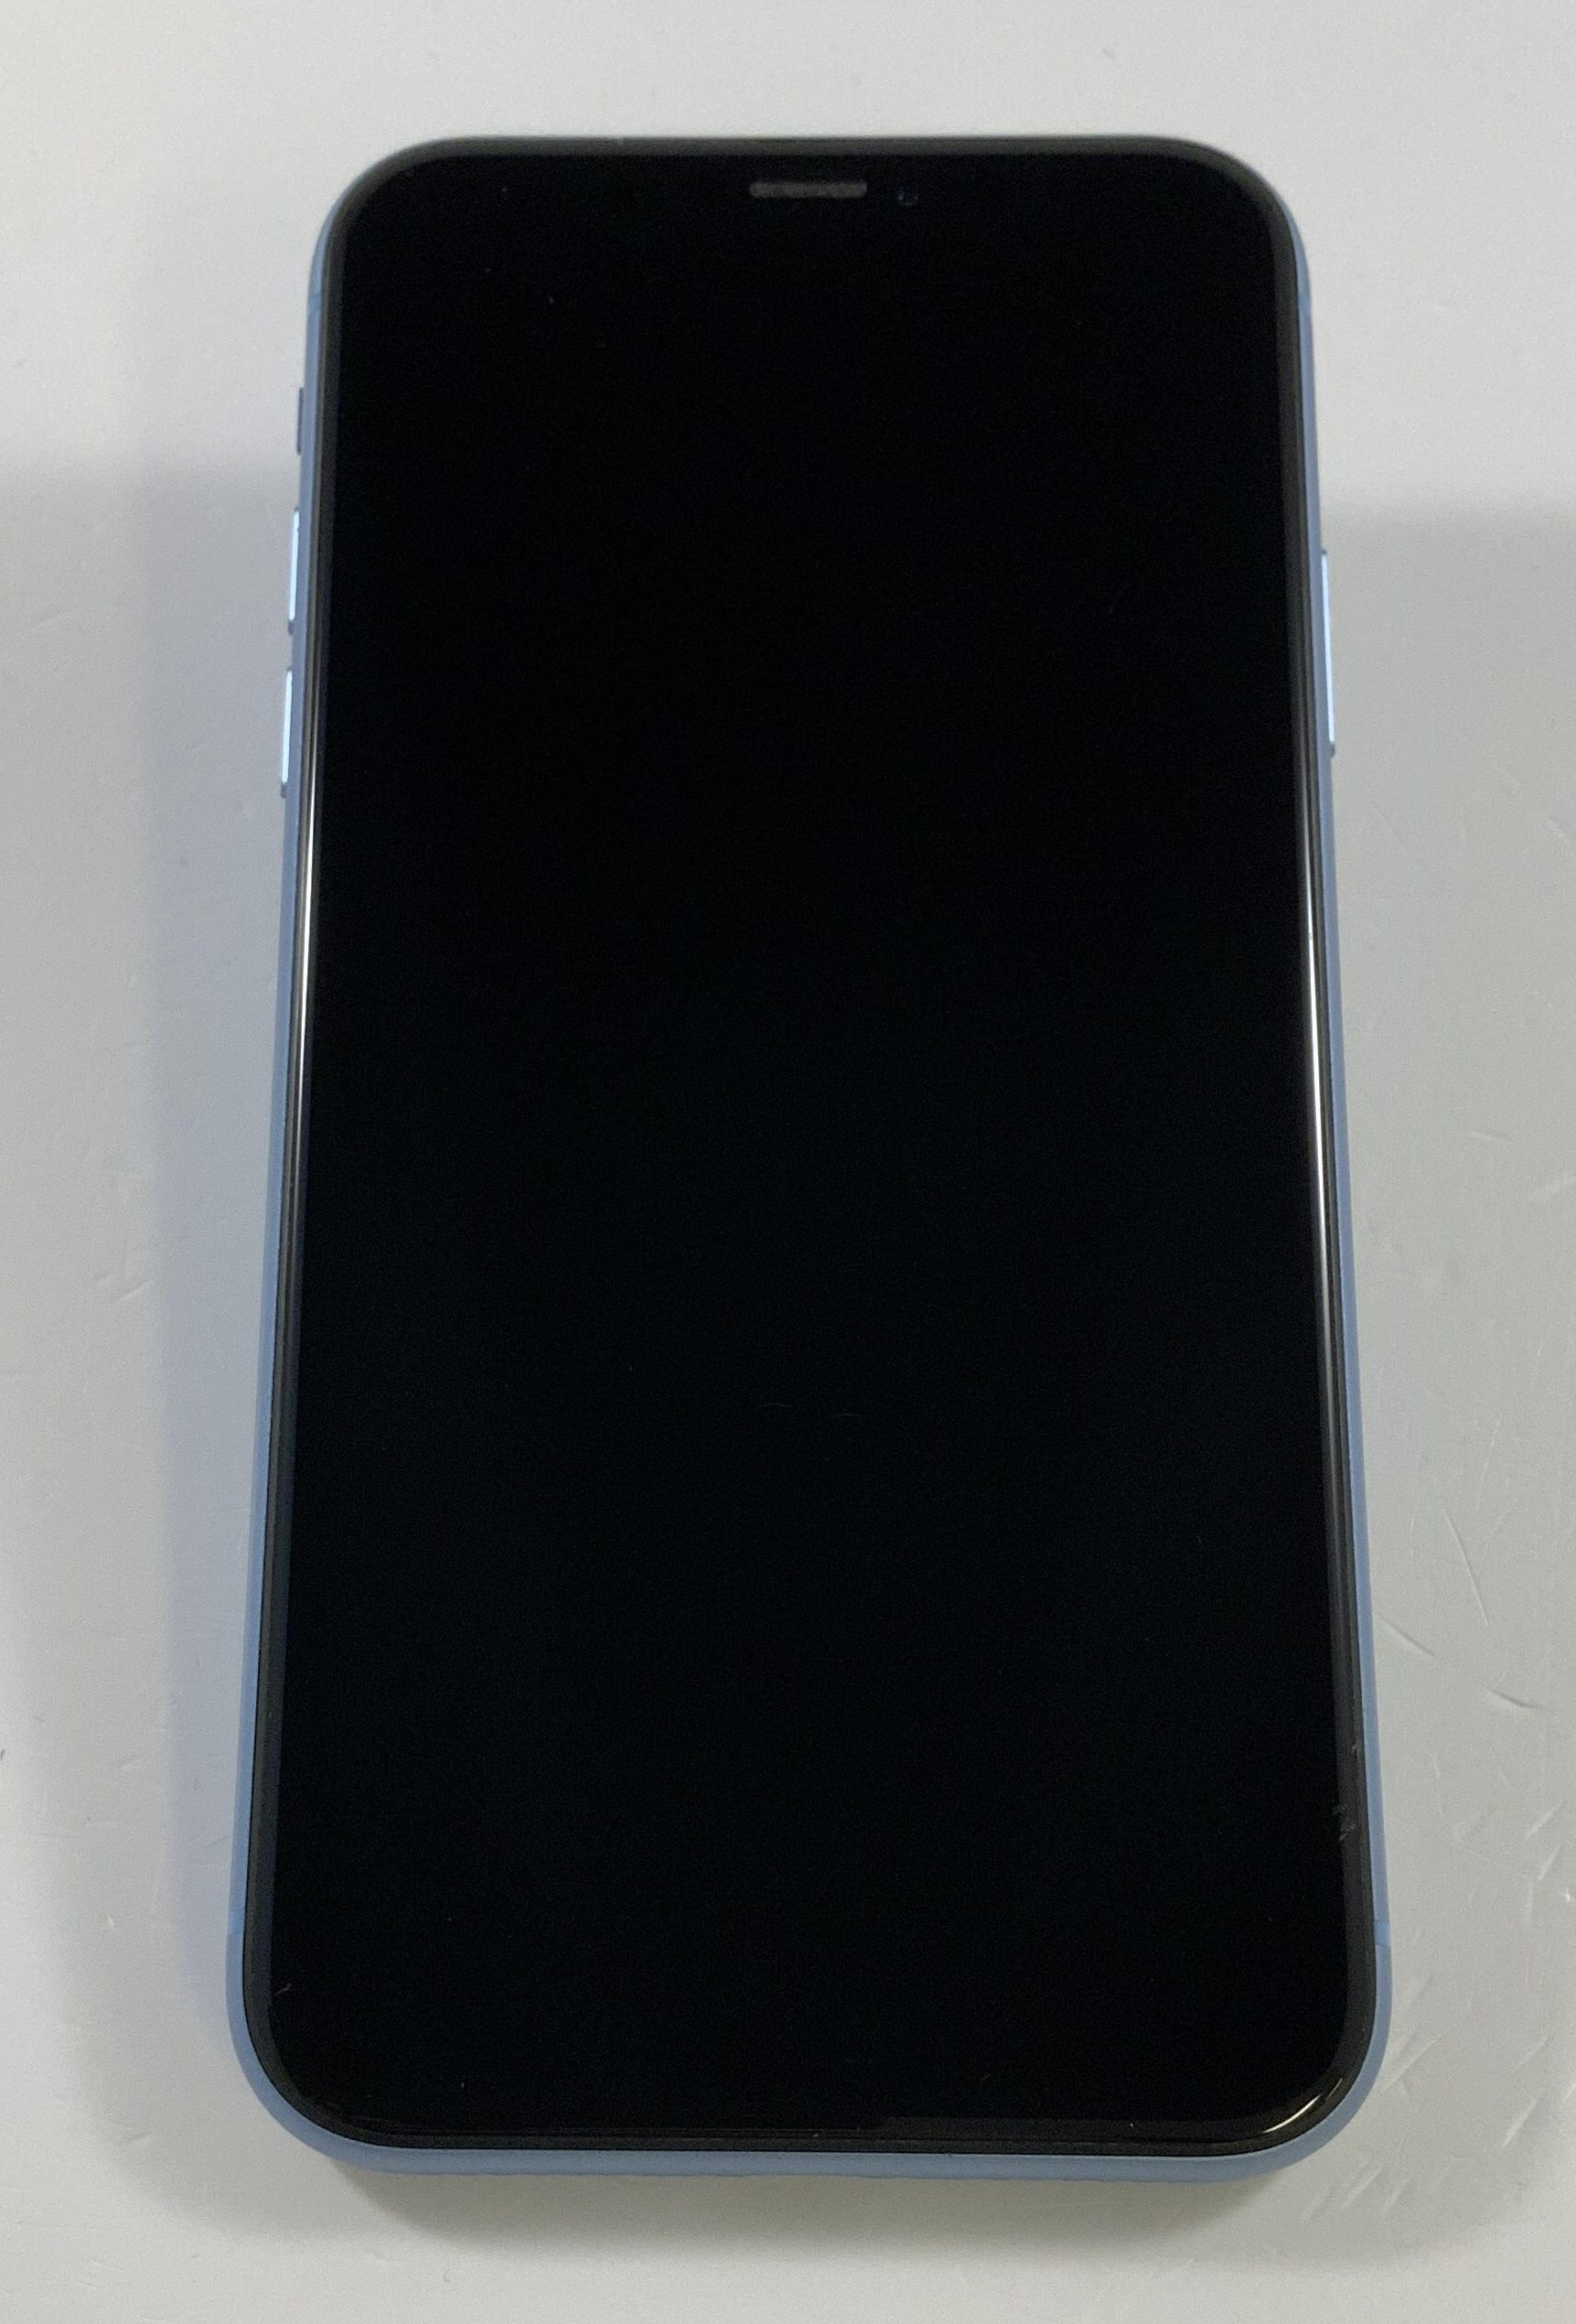 iPhone XR 128GB, 128GB, Blue, image 1